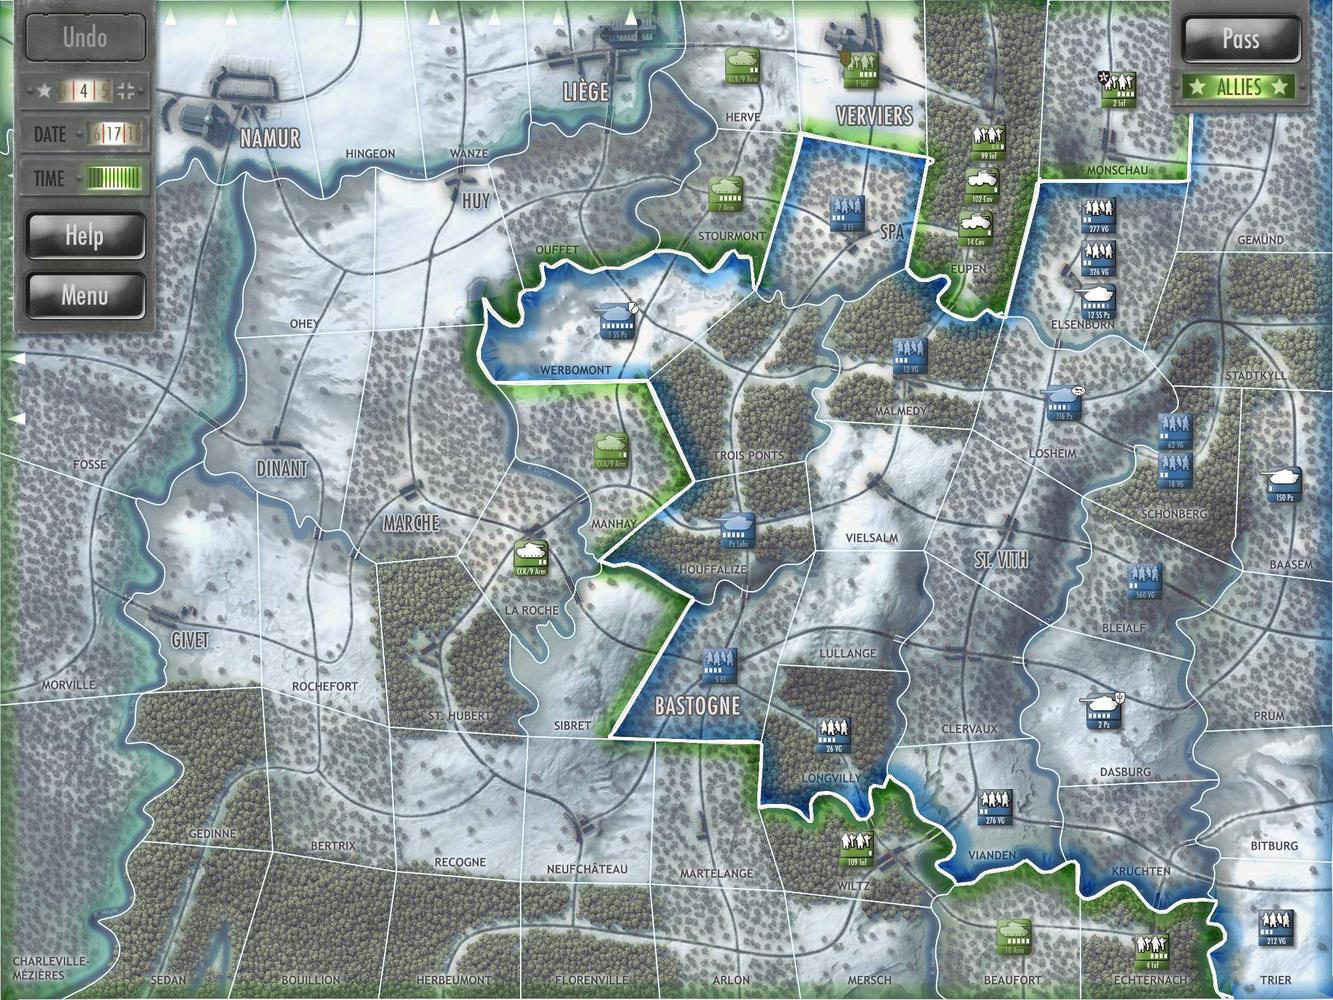 Jwi0jcirt26tihxsjnhq_map_03_1000